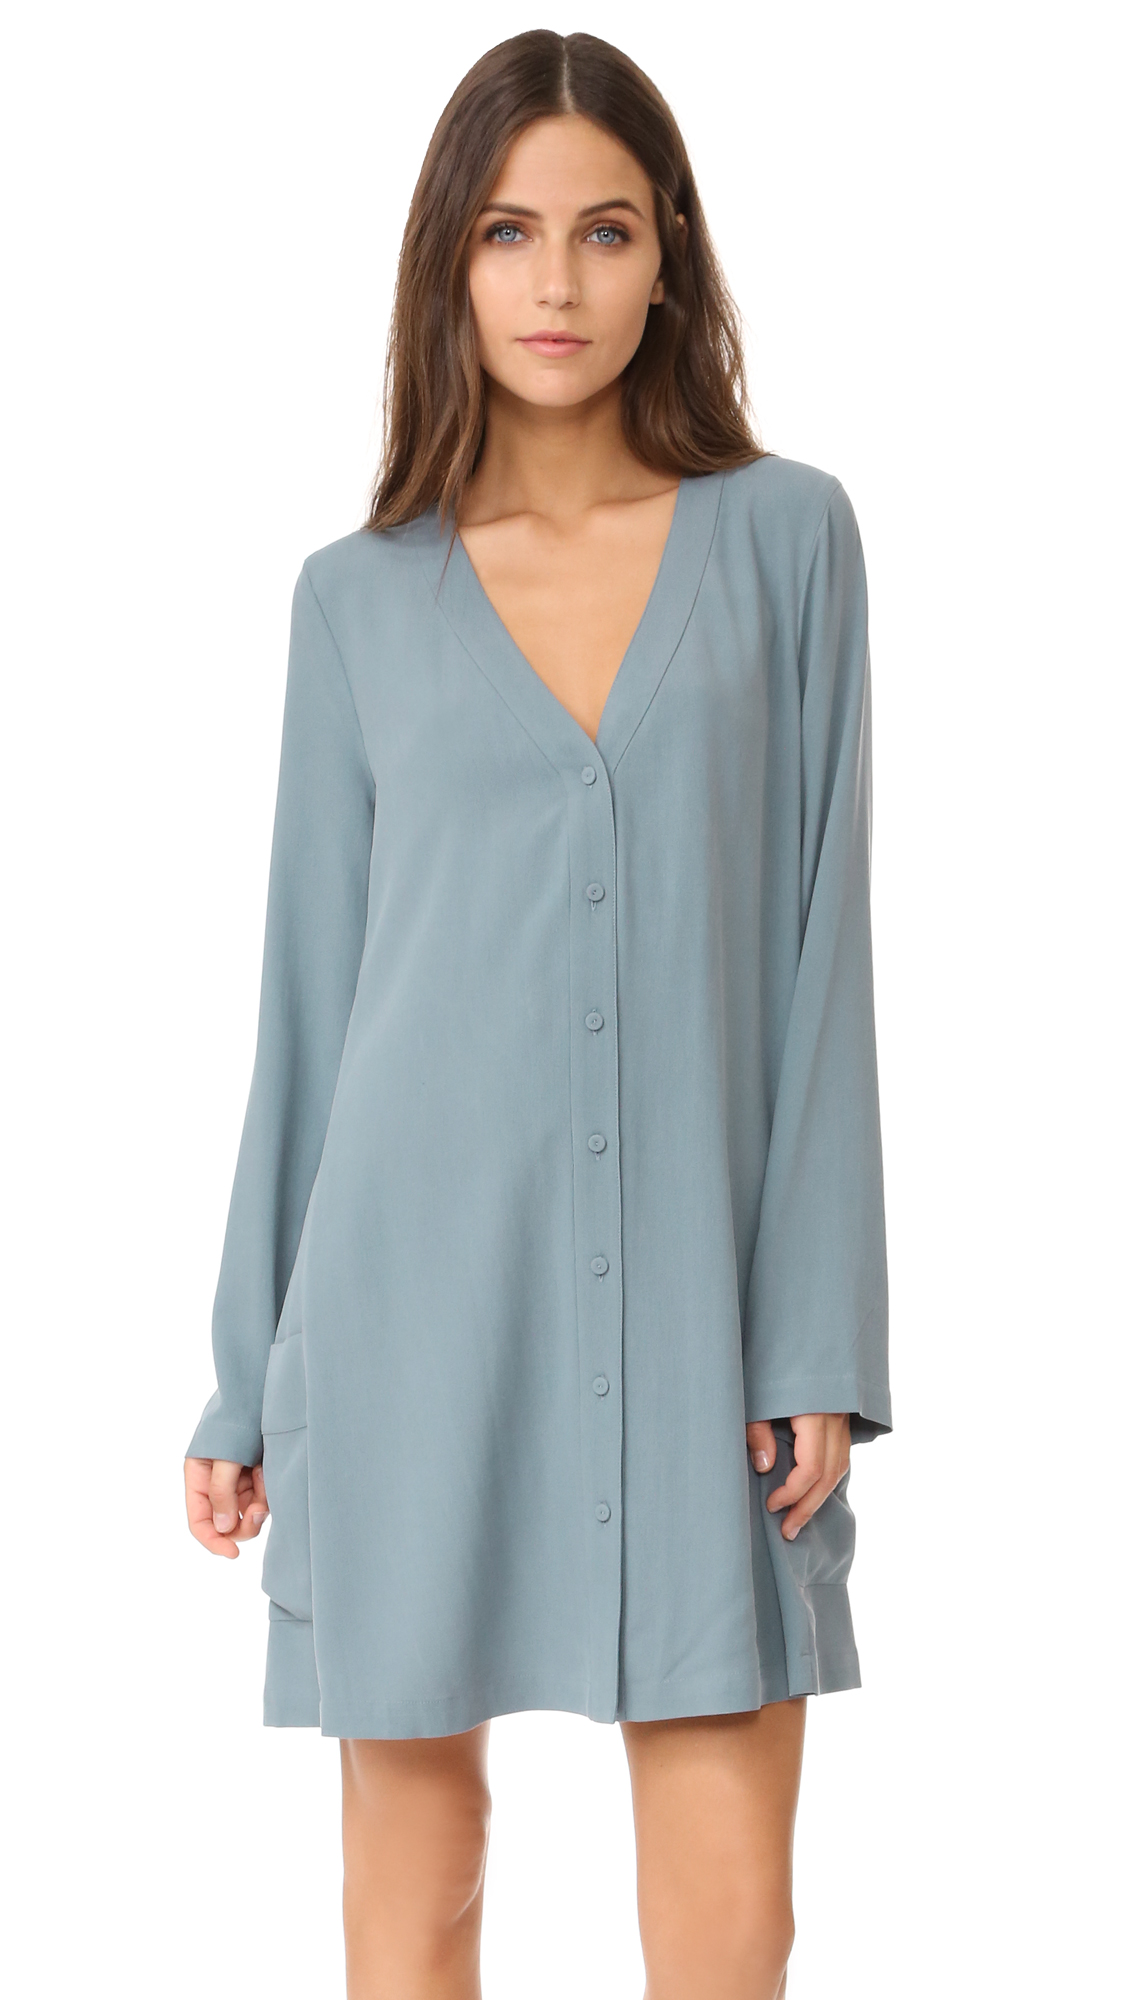 Bcbgmaxazria Button Flare Dress - Light Ash Blue at Shopbop